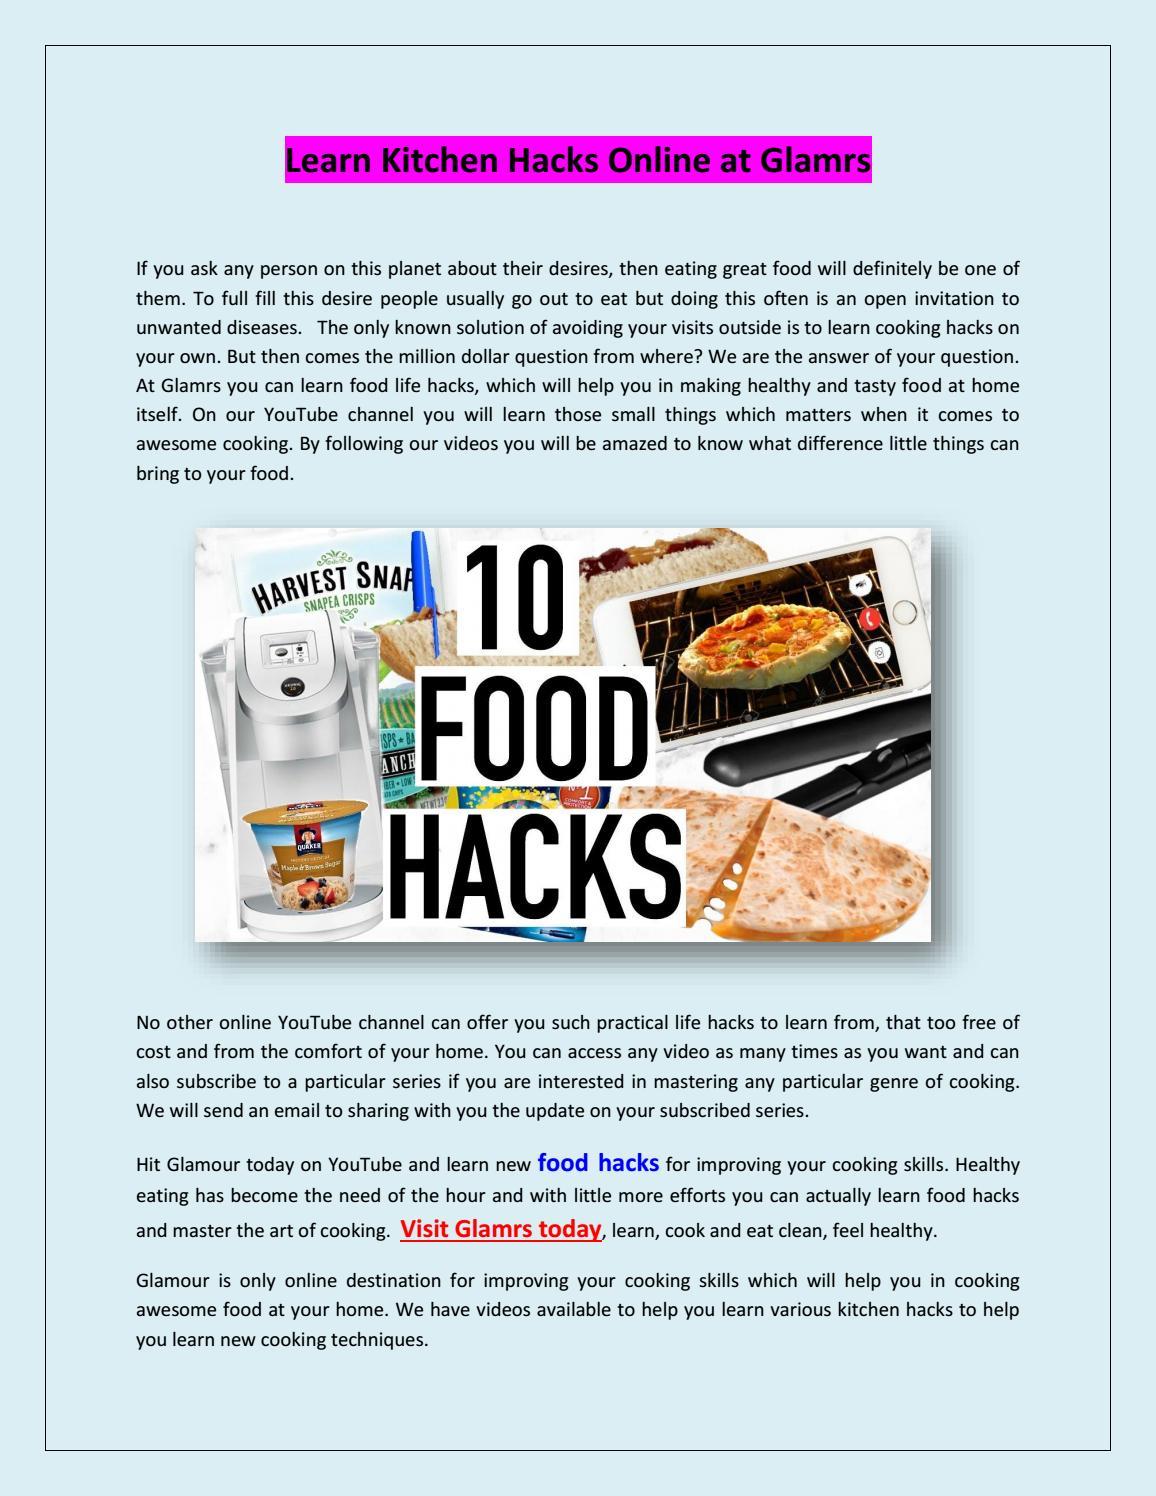 Learn kitchen hacks online at glamrs by shyam mishra - issuu